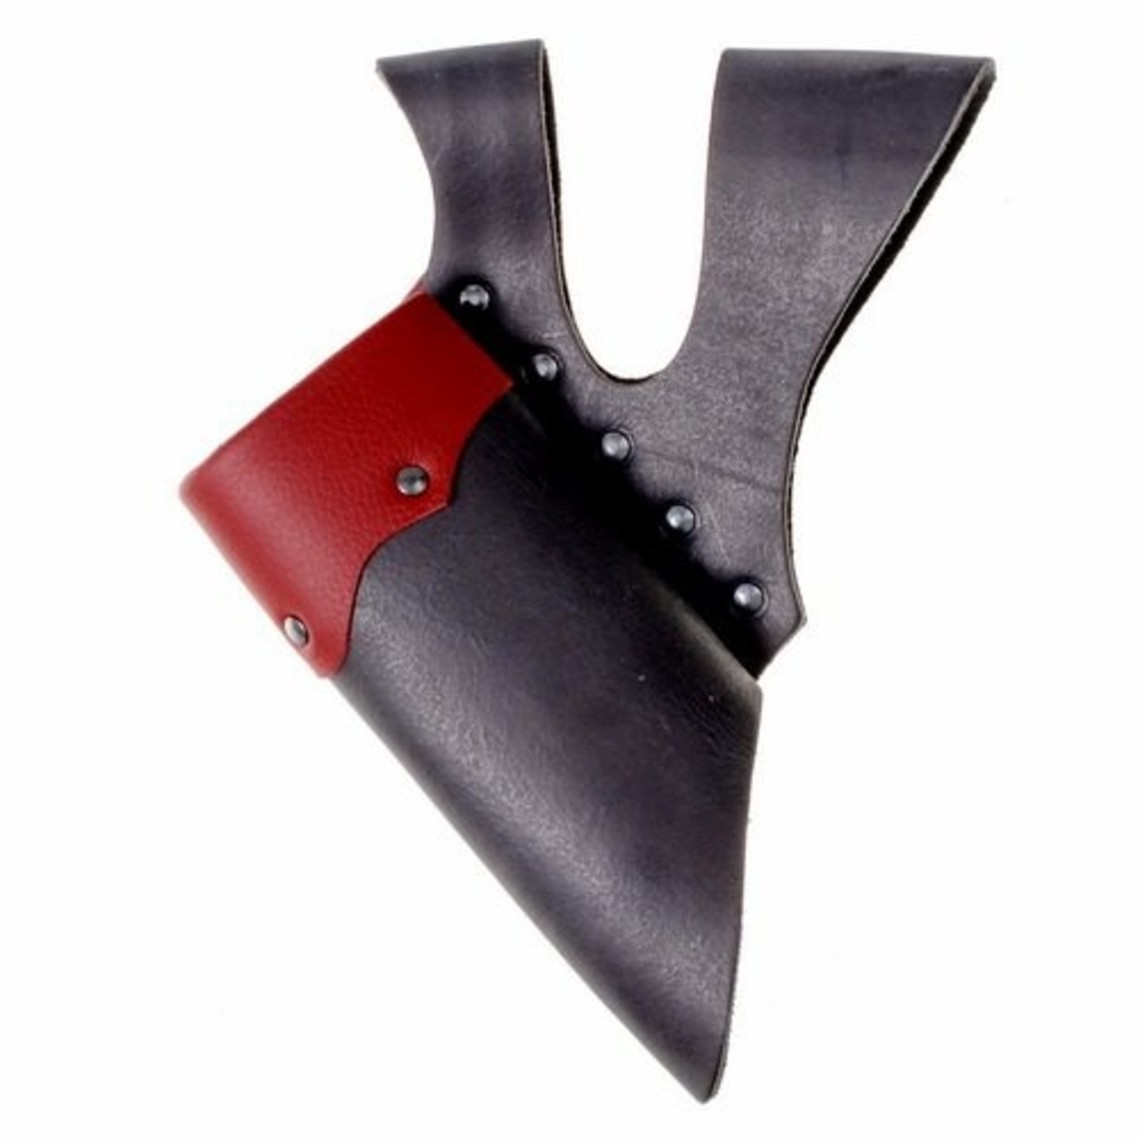 titular de cuero con doble circuito de espadas LARP, rojo-negro